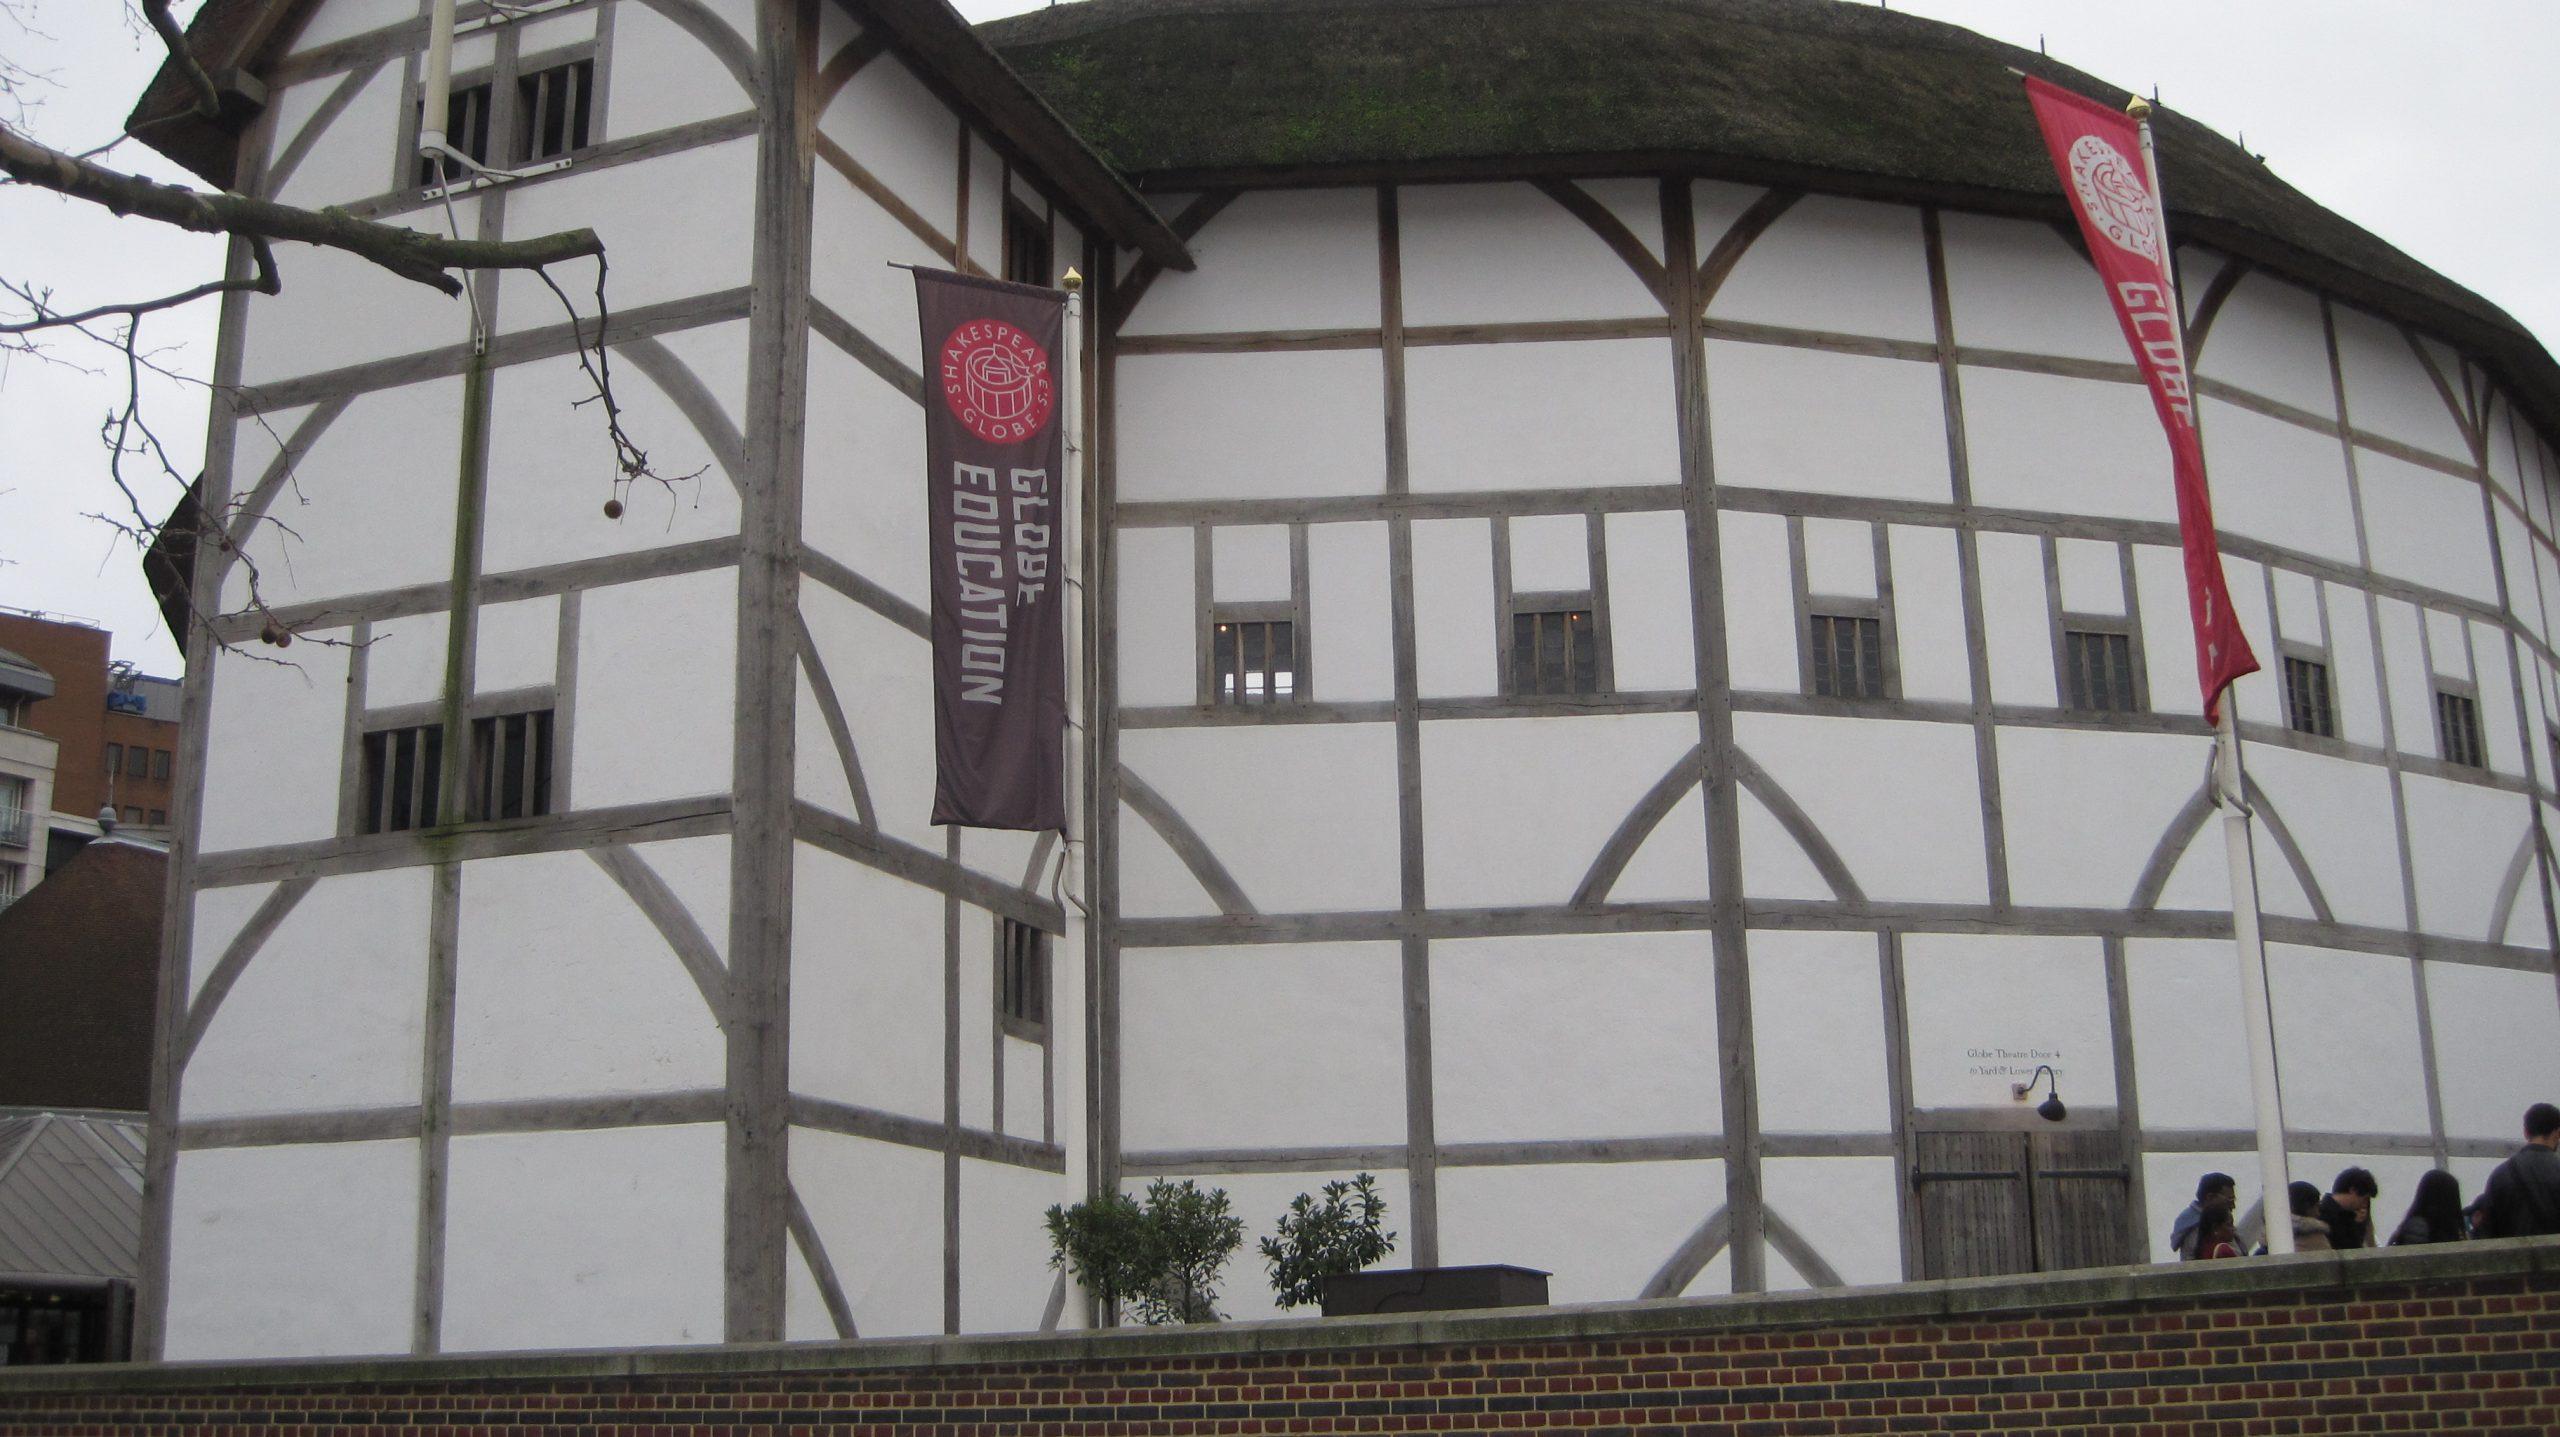 Globe Theatre by Juliamaud